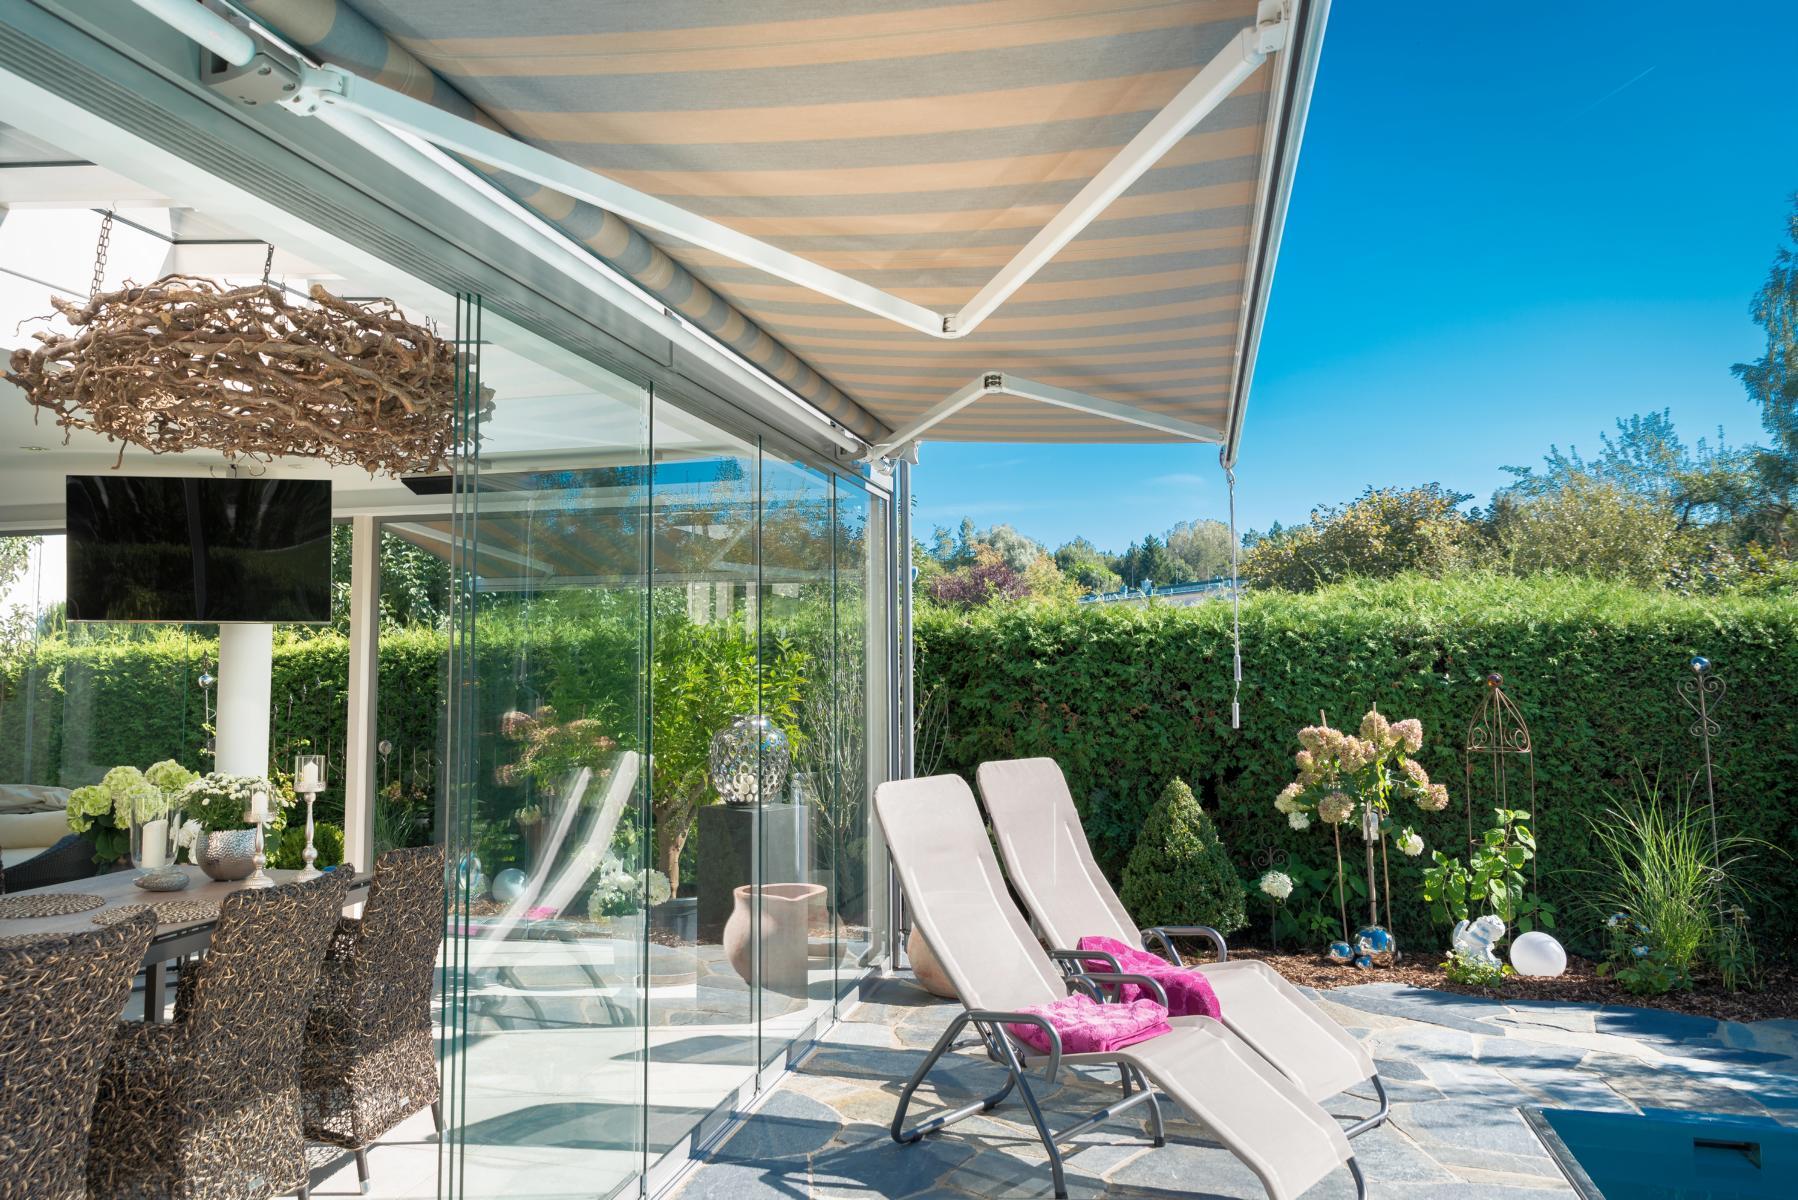 flachdachwintergarten kuhbus als kaltsystem brack. Black Bedroom Furniture Sets. Home Design Ideas